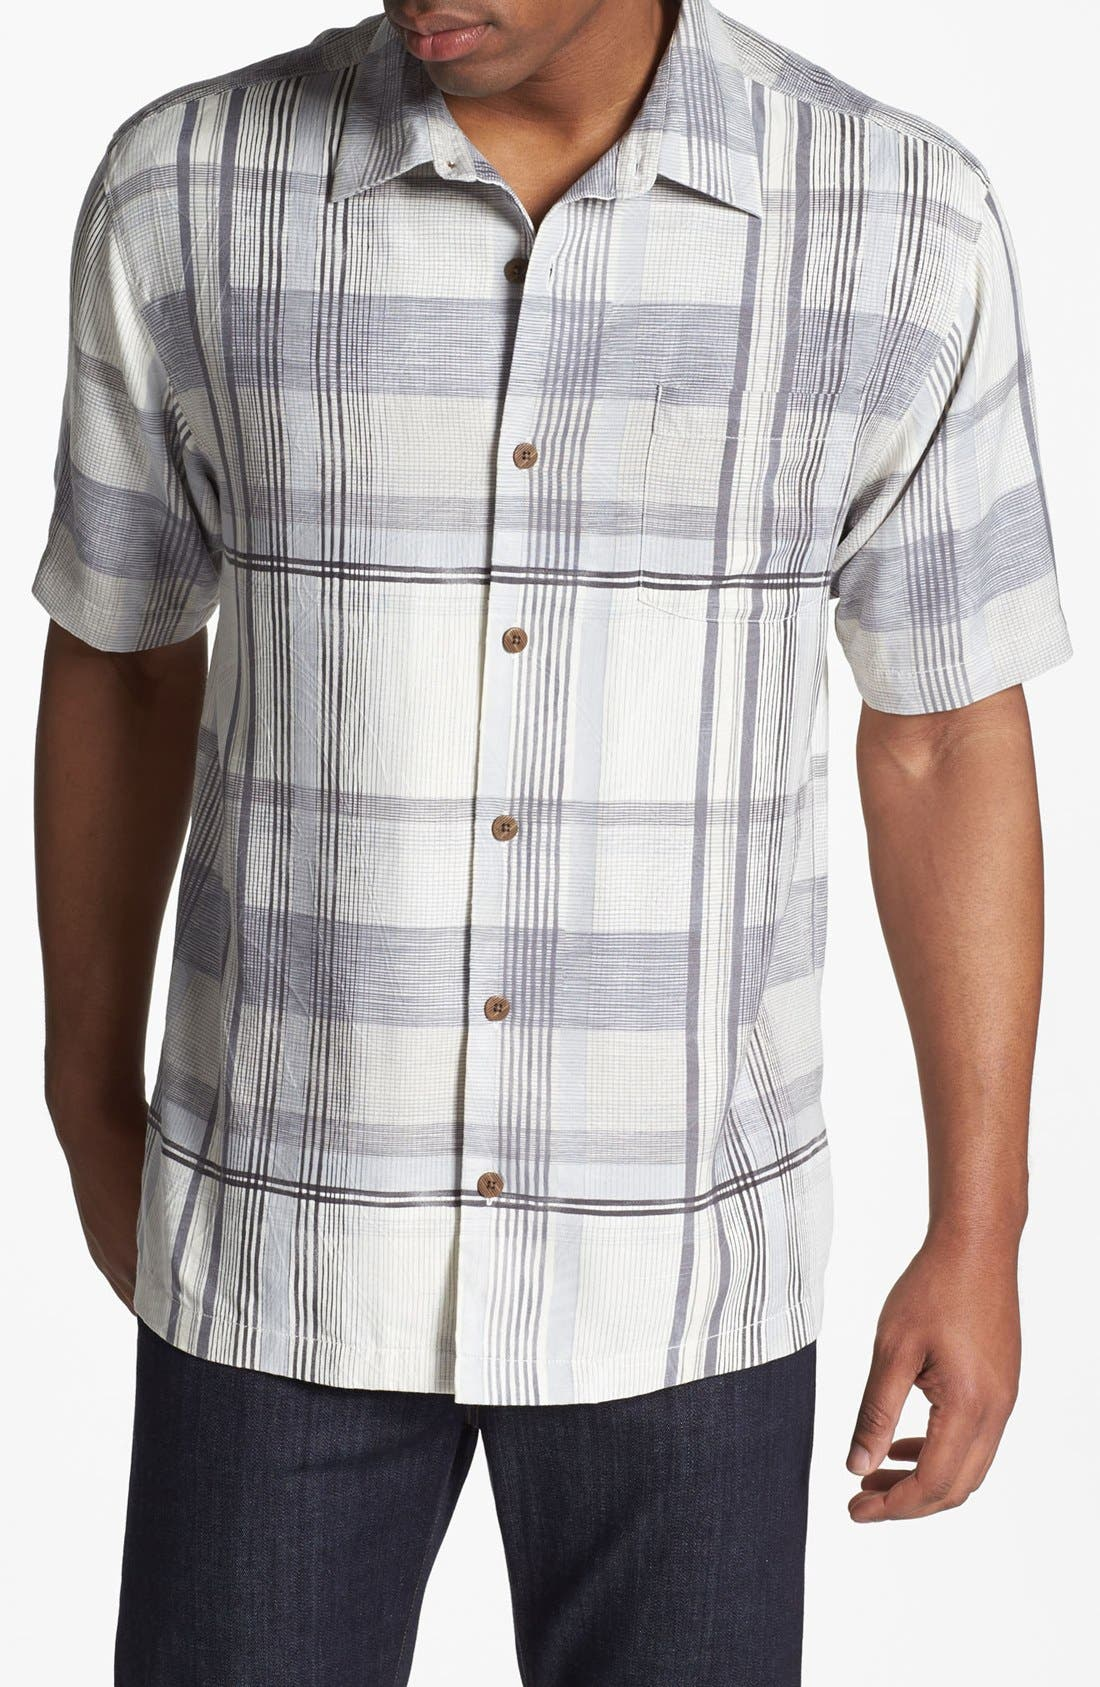 Main Image - Tommy Bahama 'Plaid Vallarta' Silk Campshirt